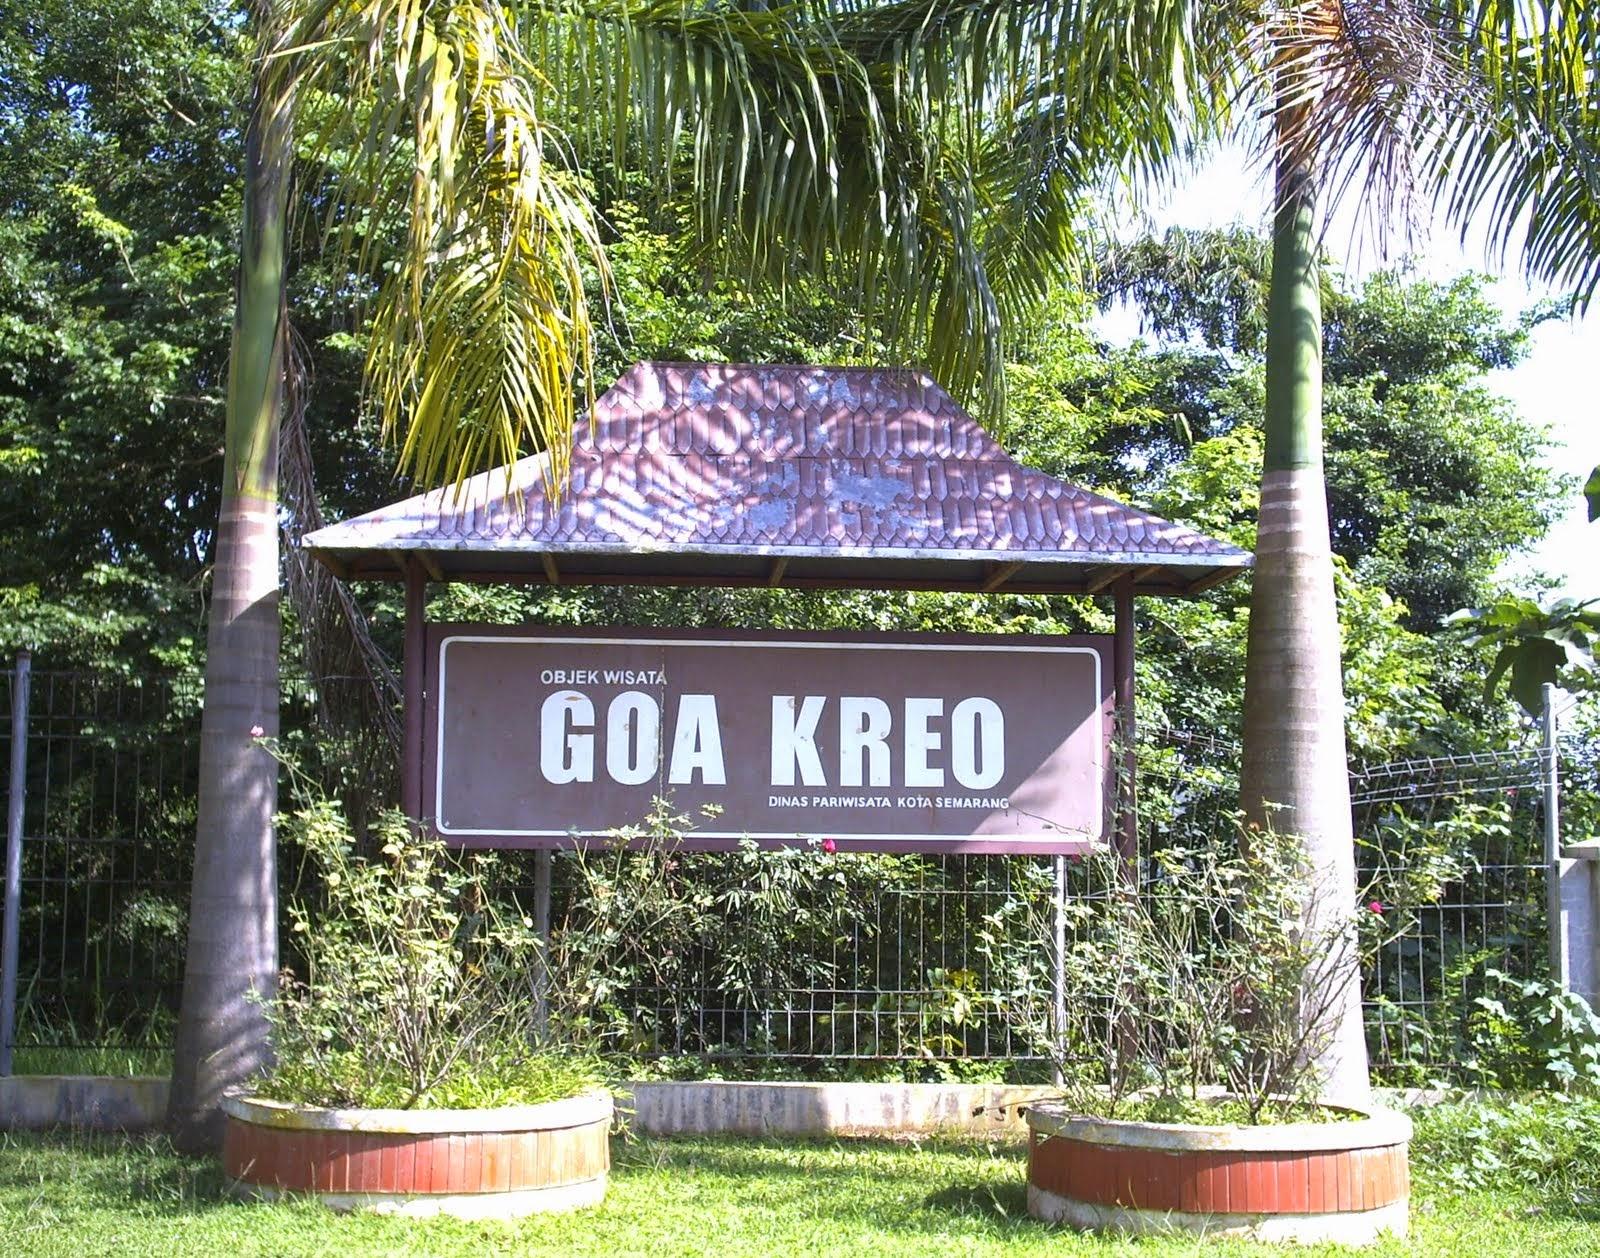 Update 30 Tempat Wisata Semarang Kunjungi Part Goa Kreo Miniatur